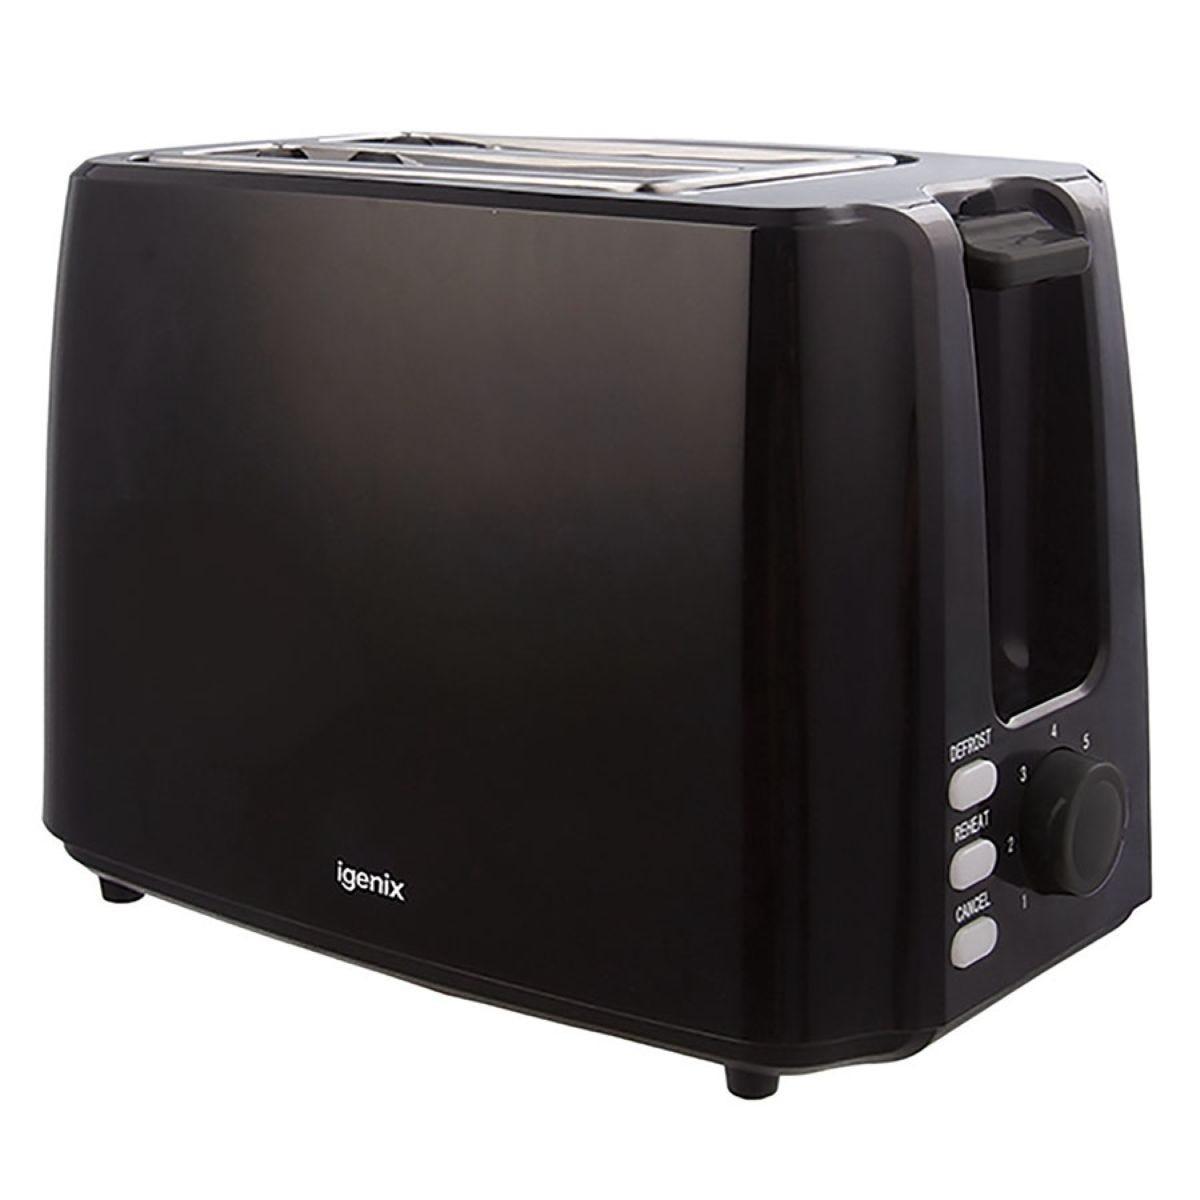 Igenix IG3012 2-Slice 750W Toaster - Black